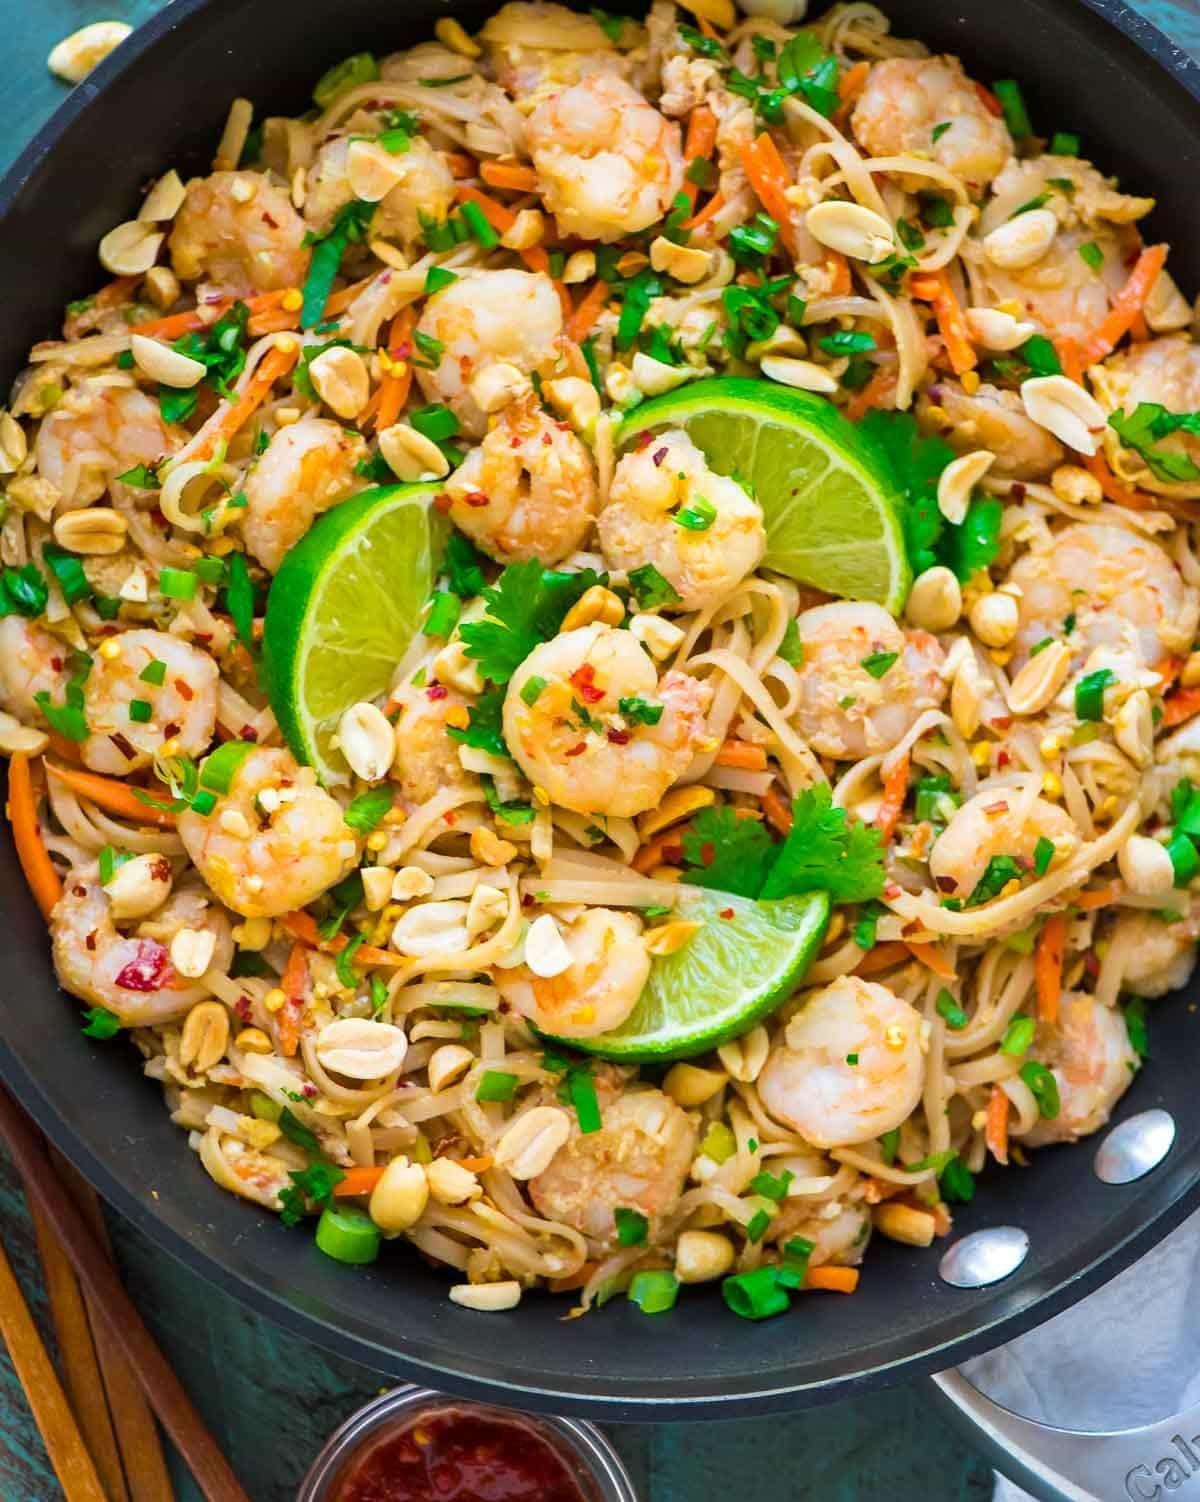 Healthy Shrimp Pad Thai Recipe the top 20 Ideas About Healthy Shrimp Pad Thai